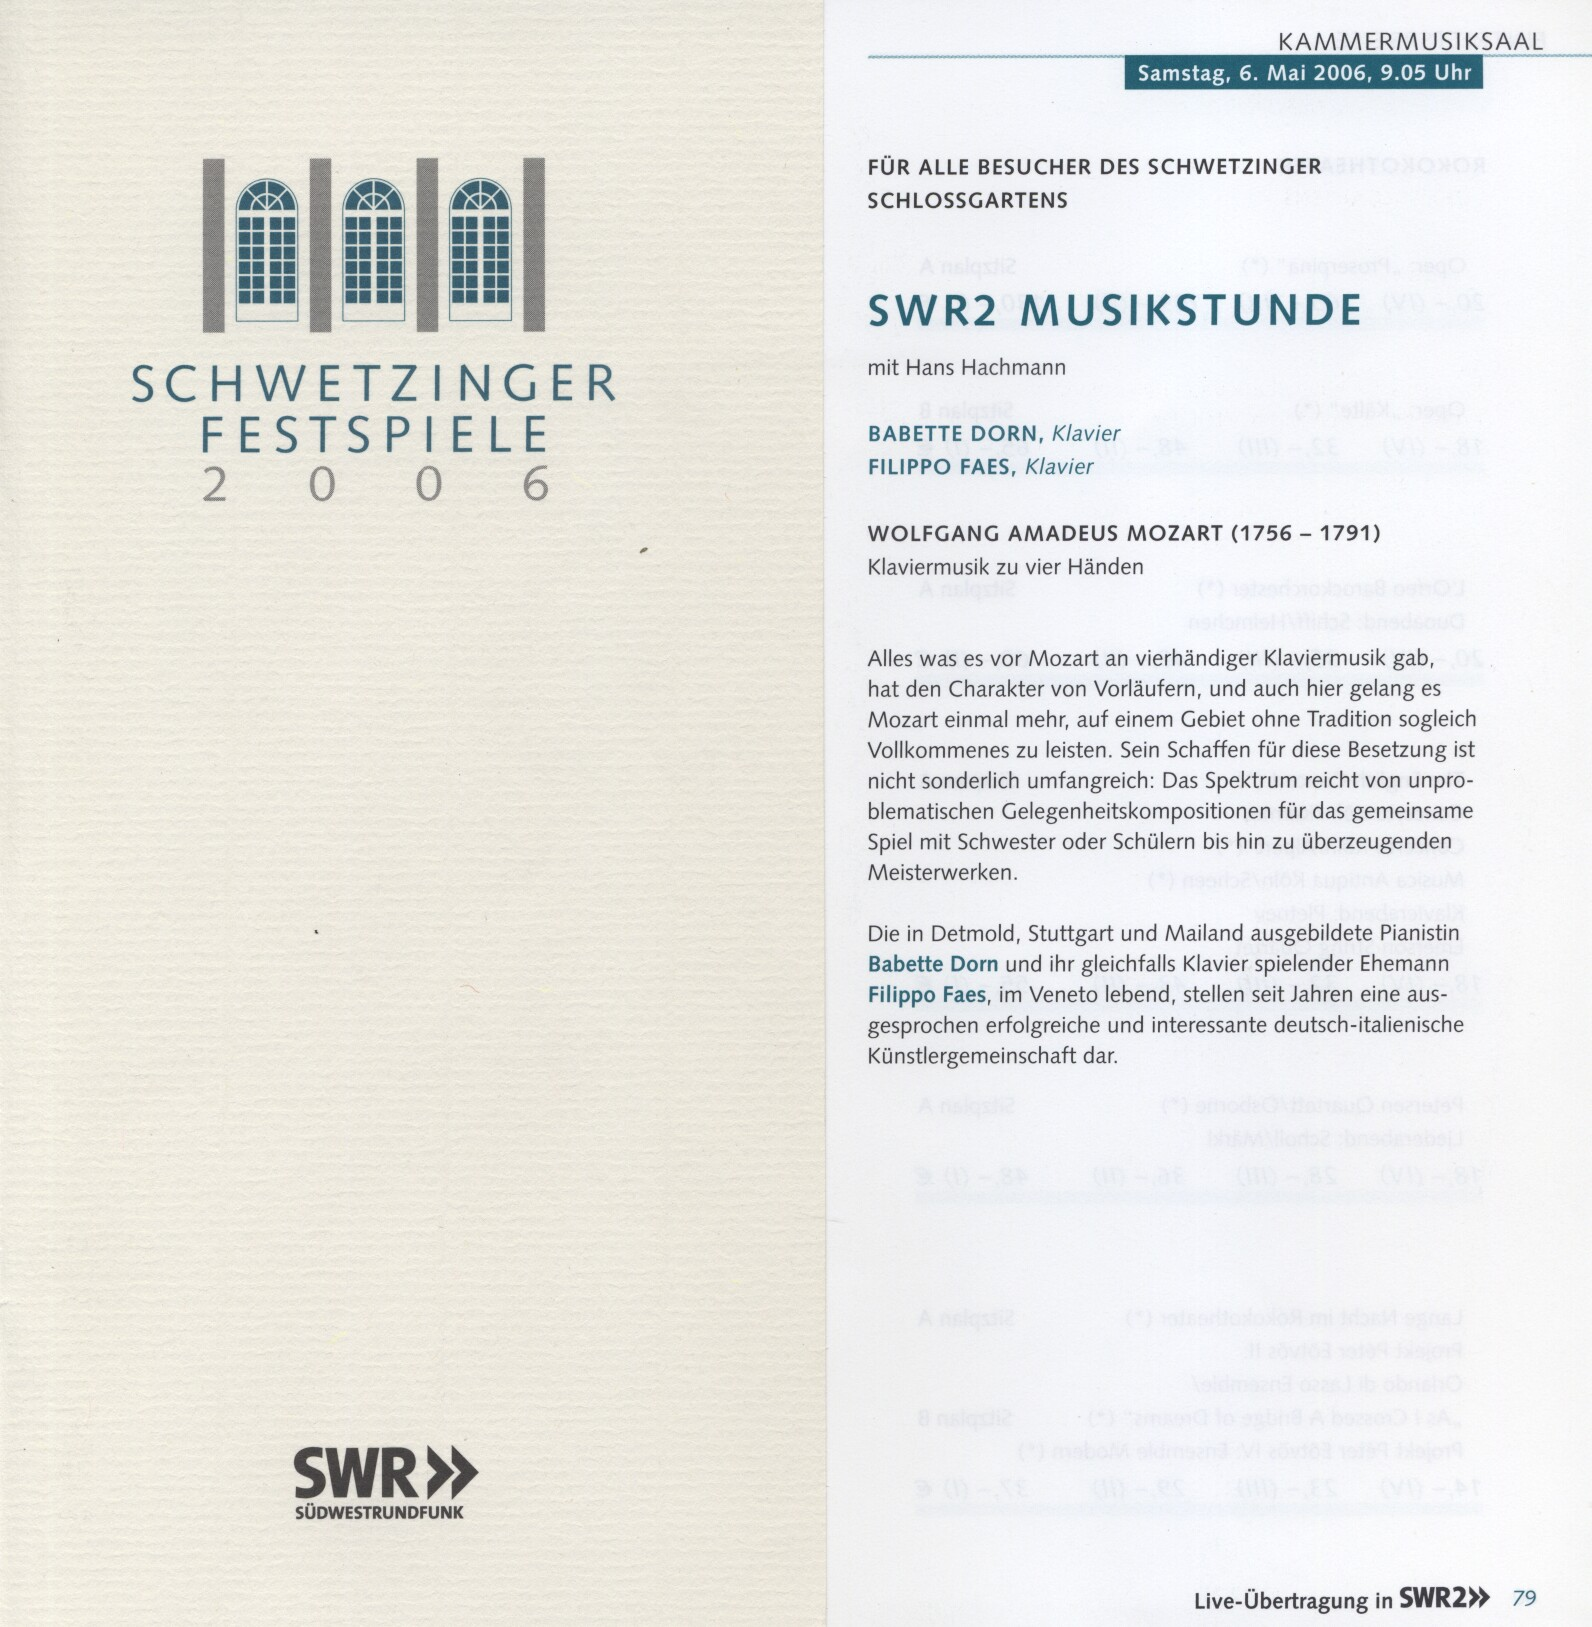 2006 Schwetzingen